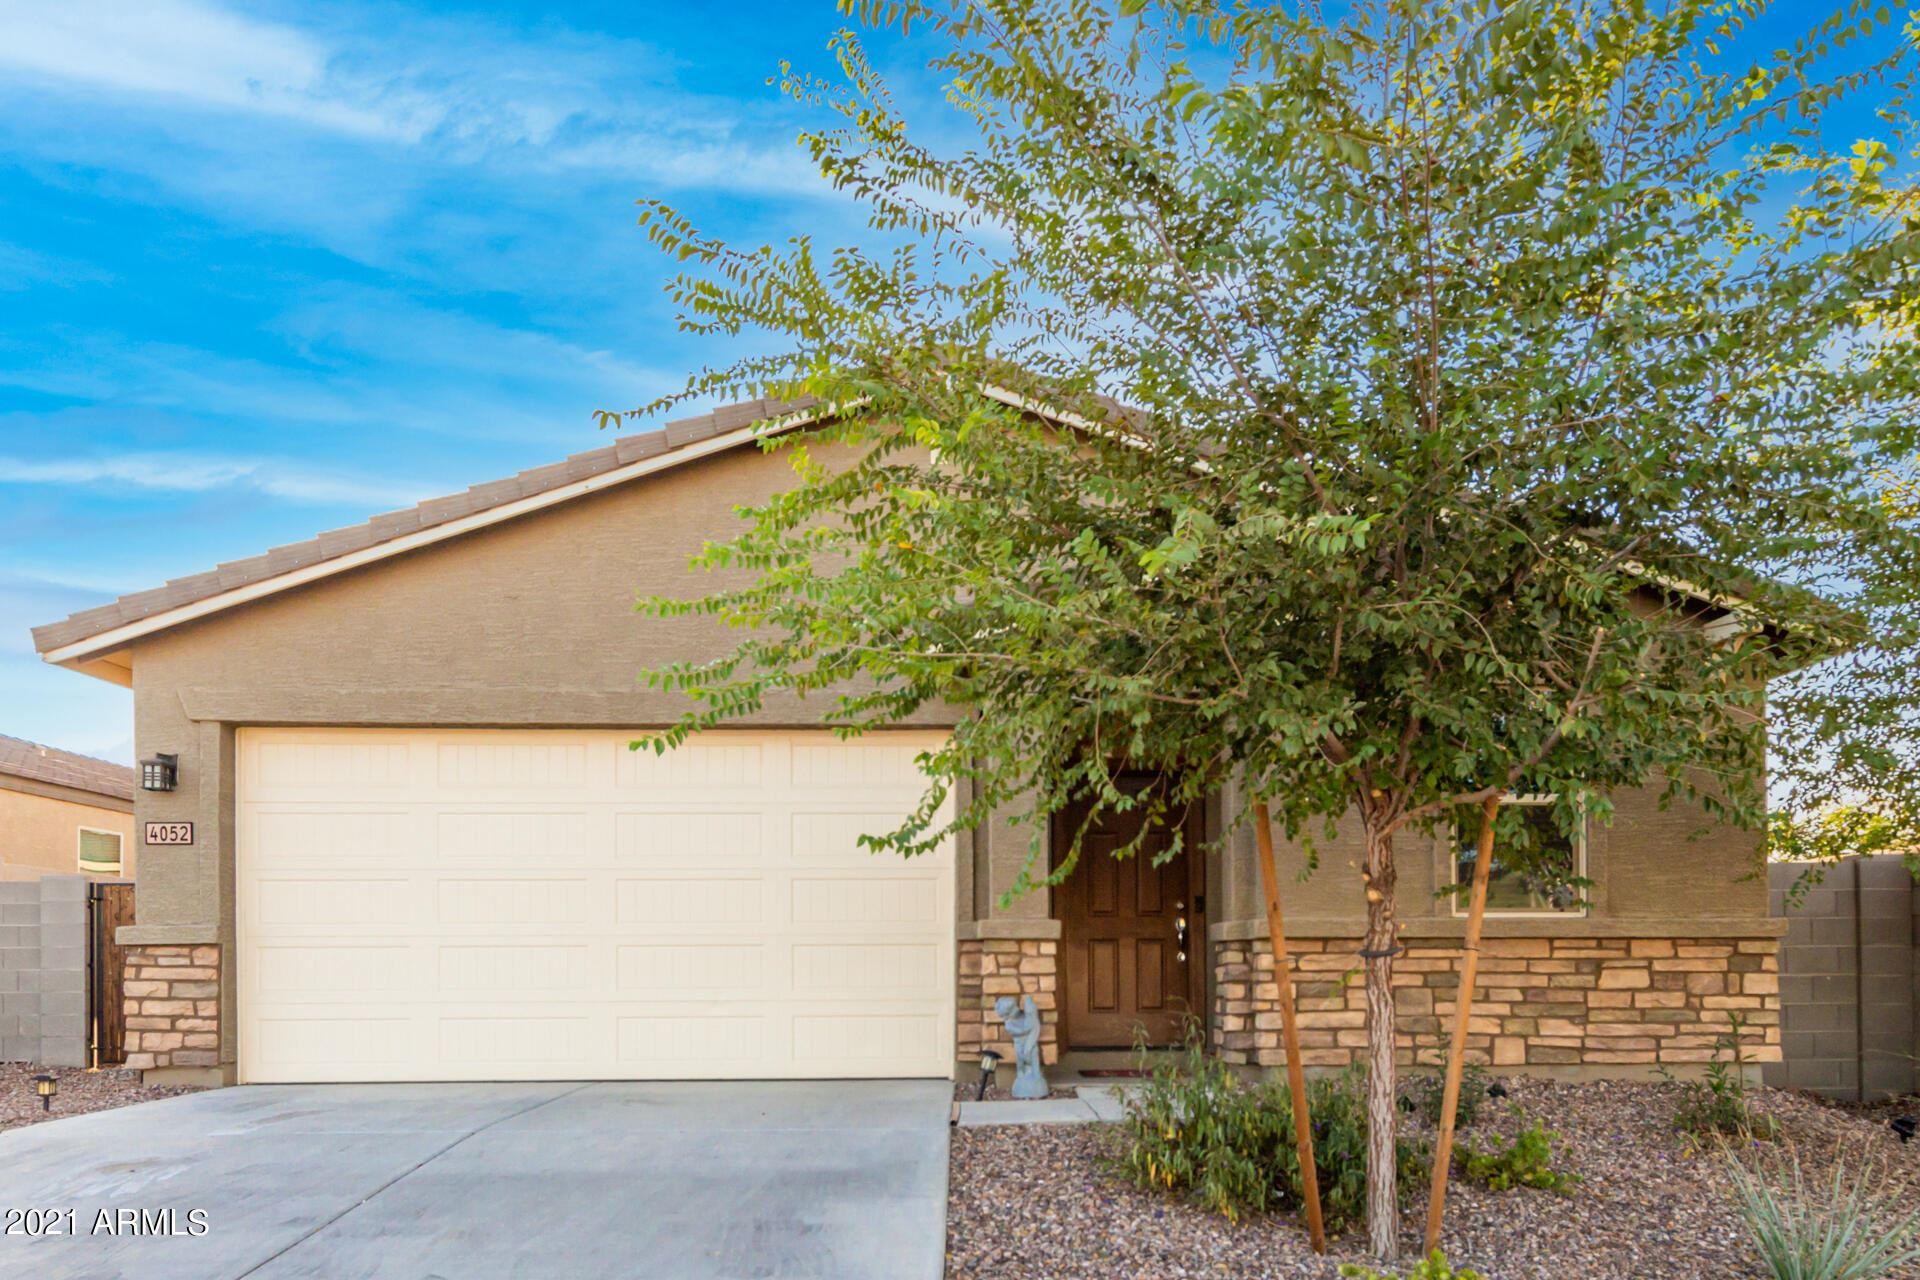 Photo of 4052 S 101ST Glen, Tolleson, AZ 85353 (MLS # 6304587)